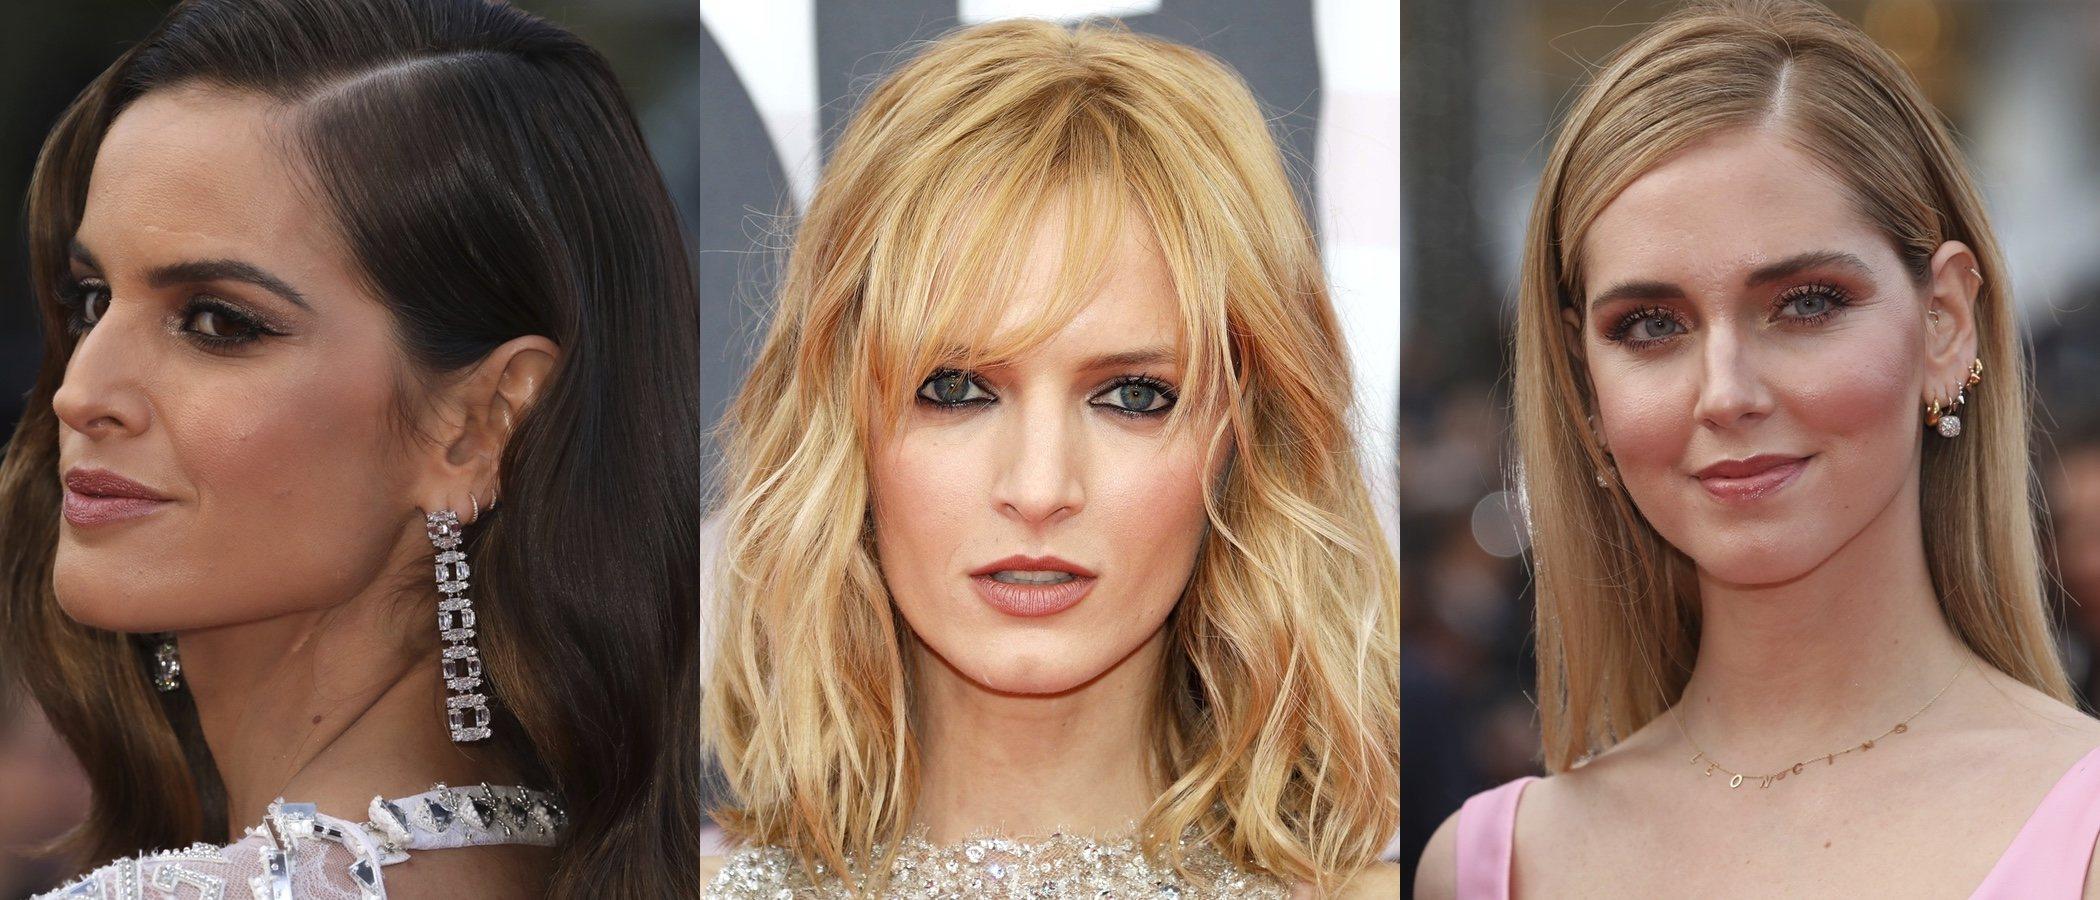 Chiara Ferragni, Izabel Goulart y Daria Strokous, entre los mejores beauty looks de la semana